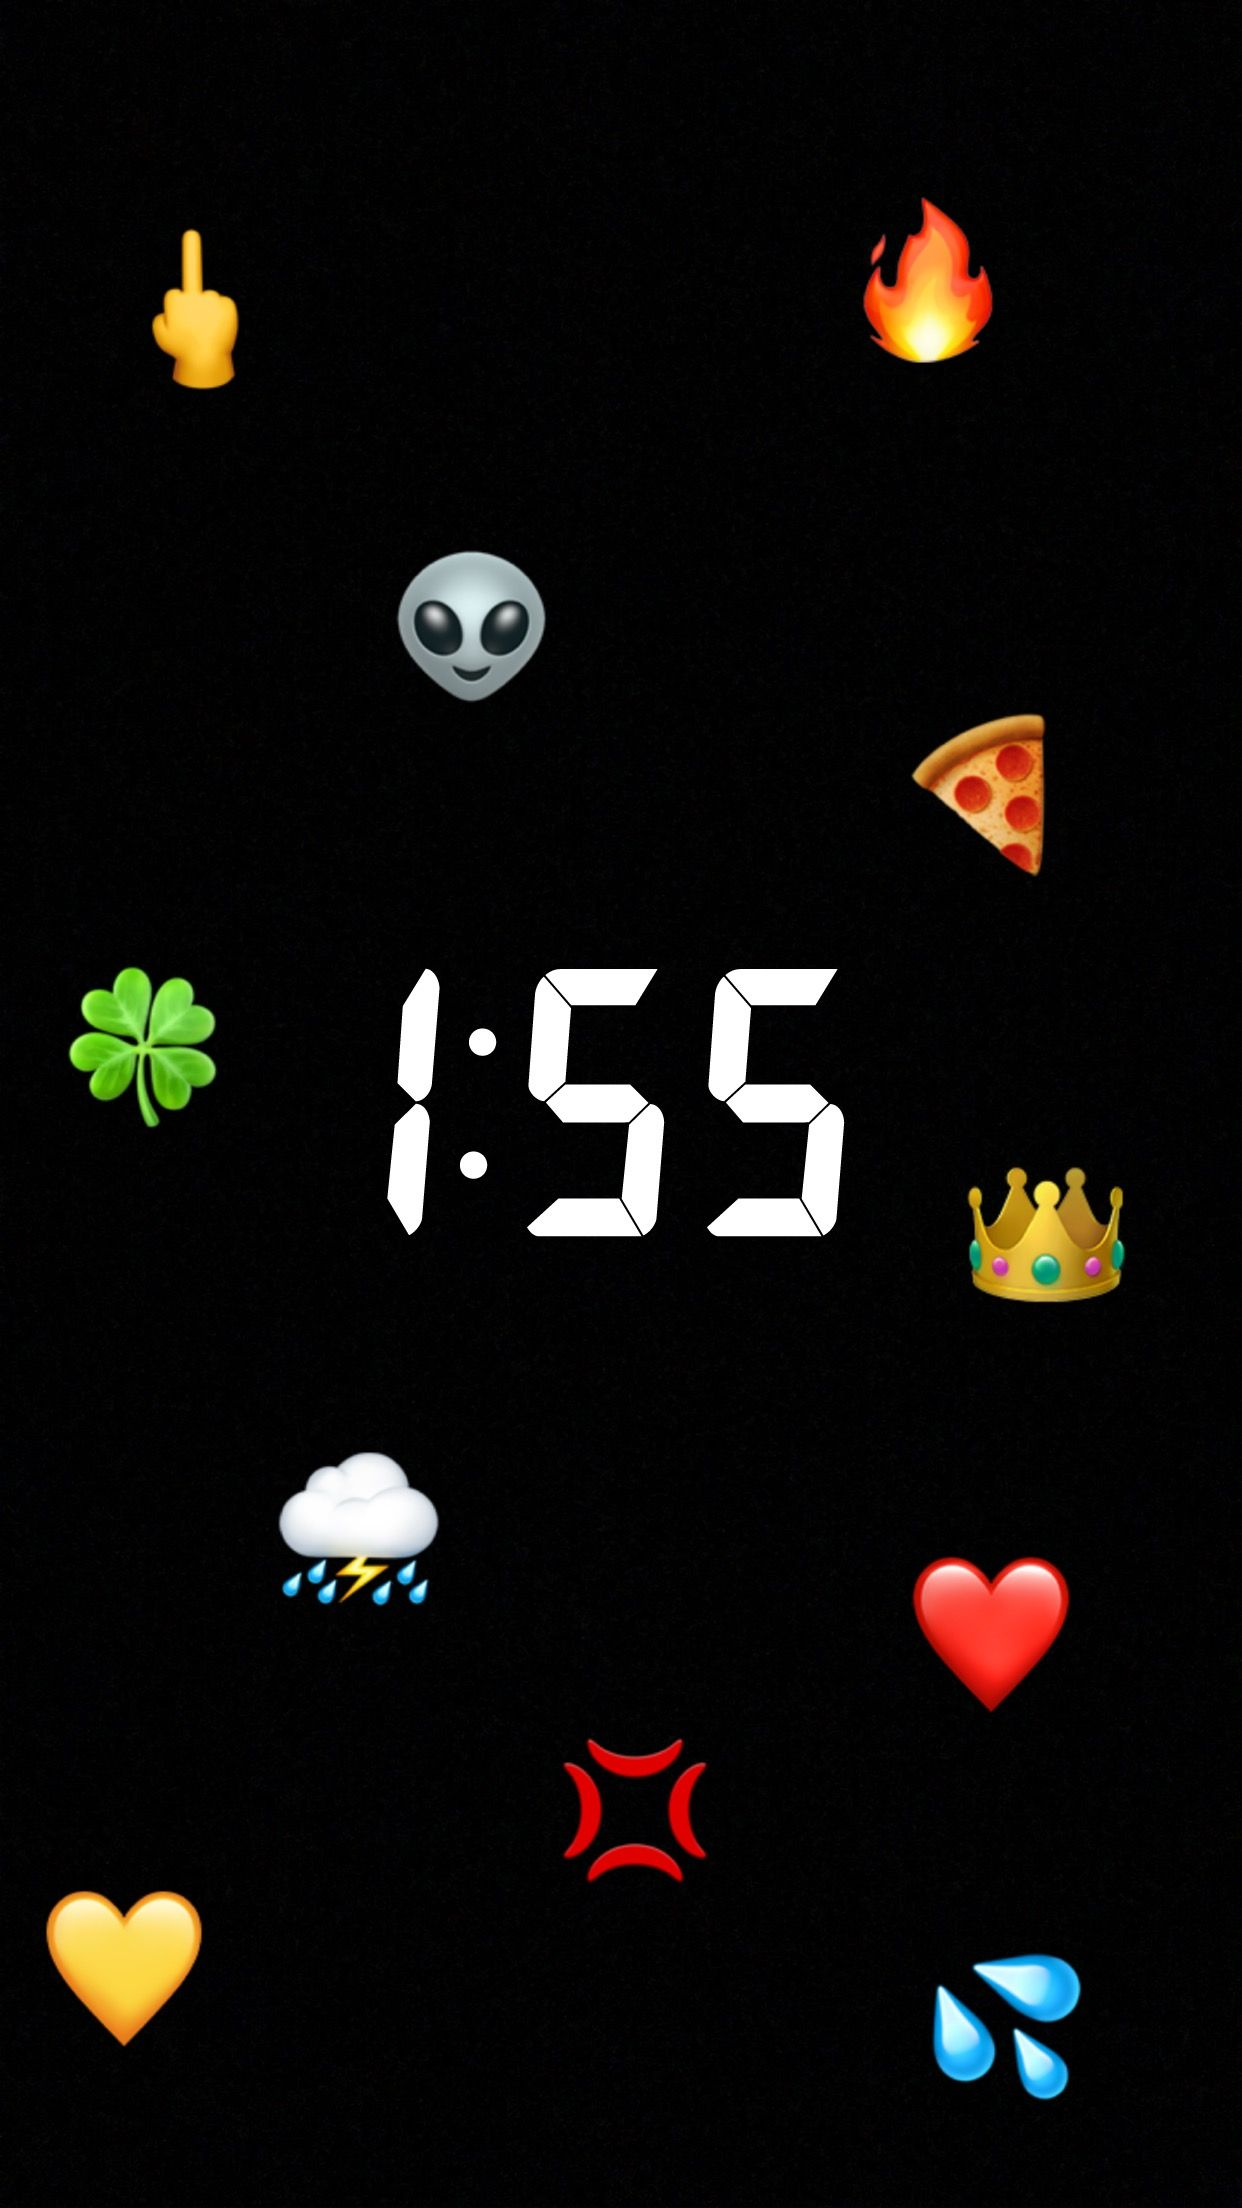 tumblr #snapchat #instagram #save #follow f | snappp | Snapchat